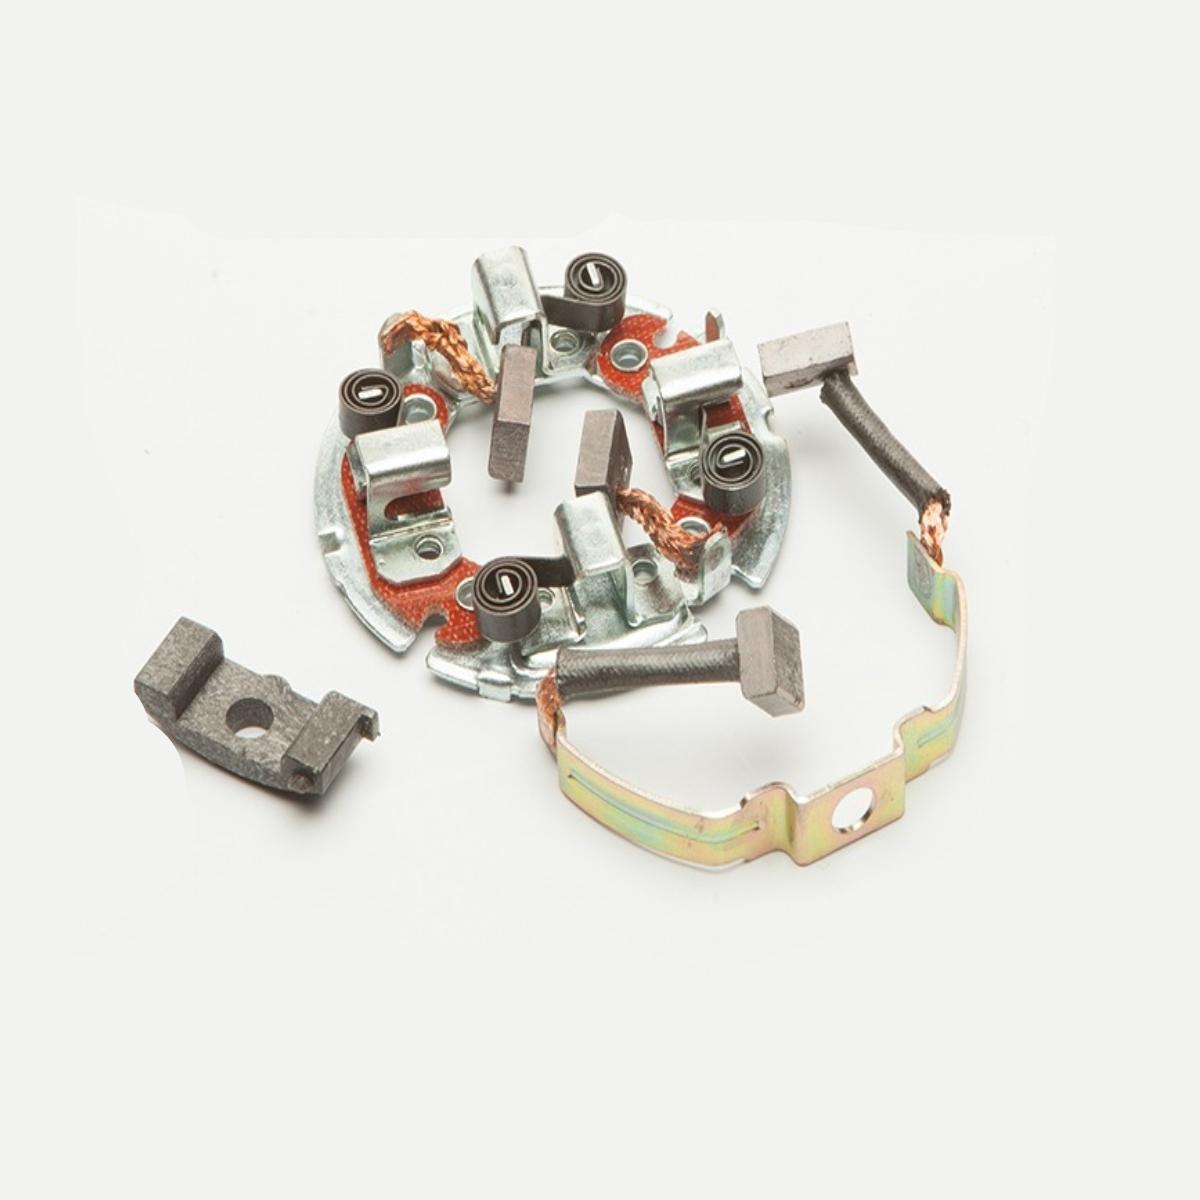 Escova Motor de Arranque Jet Ski Yamaha/Kawasaki/Sea Doo 950  - Radical Peças - Peças para Jet Ski